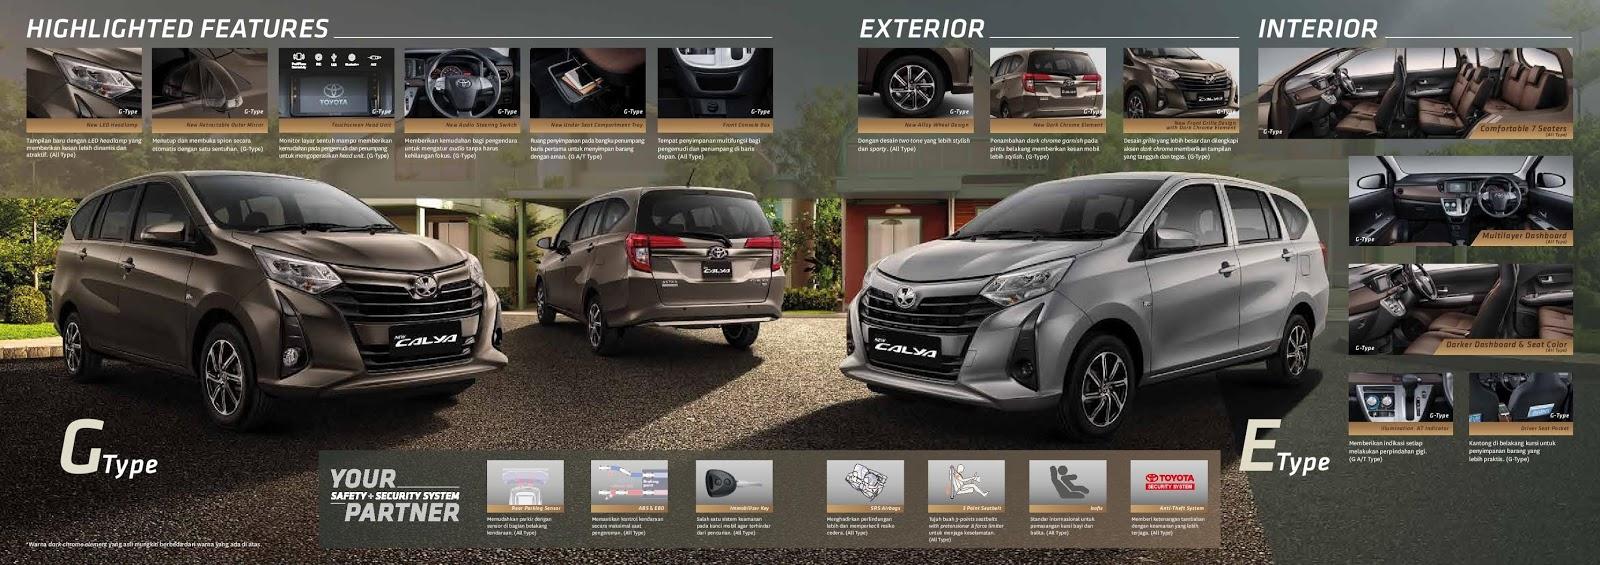 Toyota Calya Pekanbaru